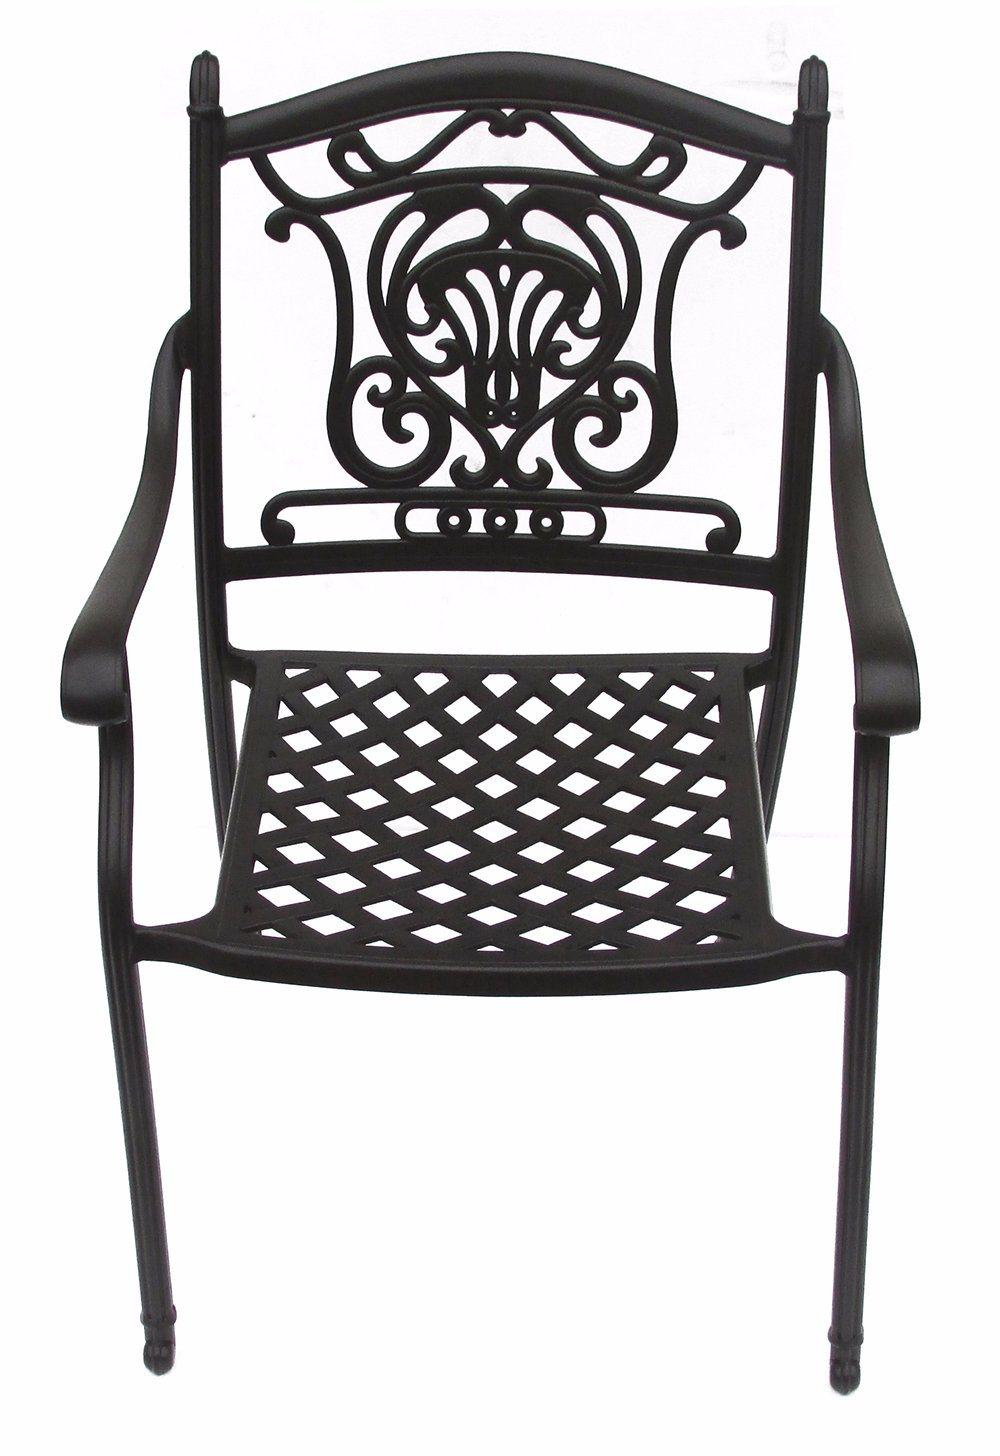 Astounding Hot Item Creative Living Garden Furniture Cool Outdoor Furniture Machost Co Dining Chair Design Ideas Machostcouk